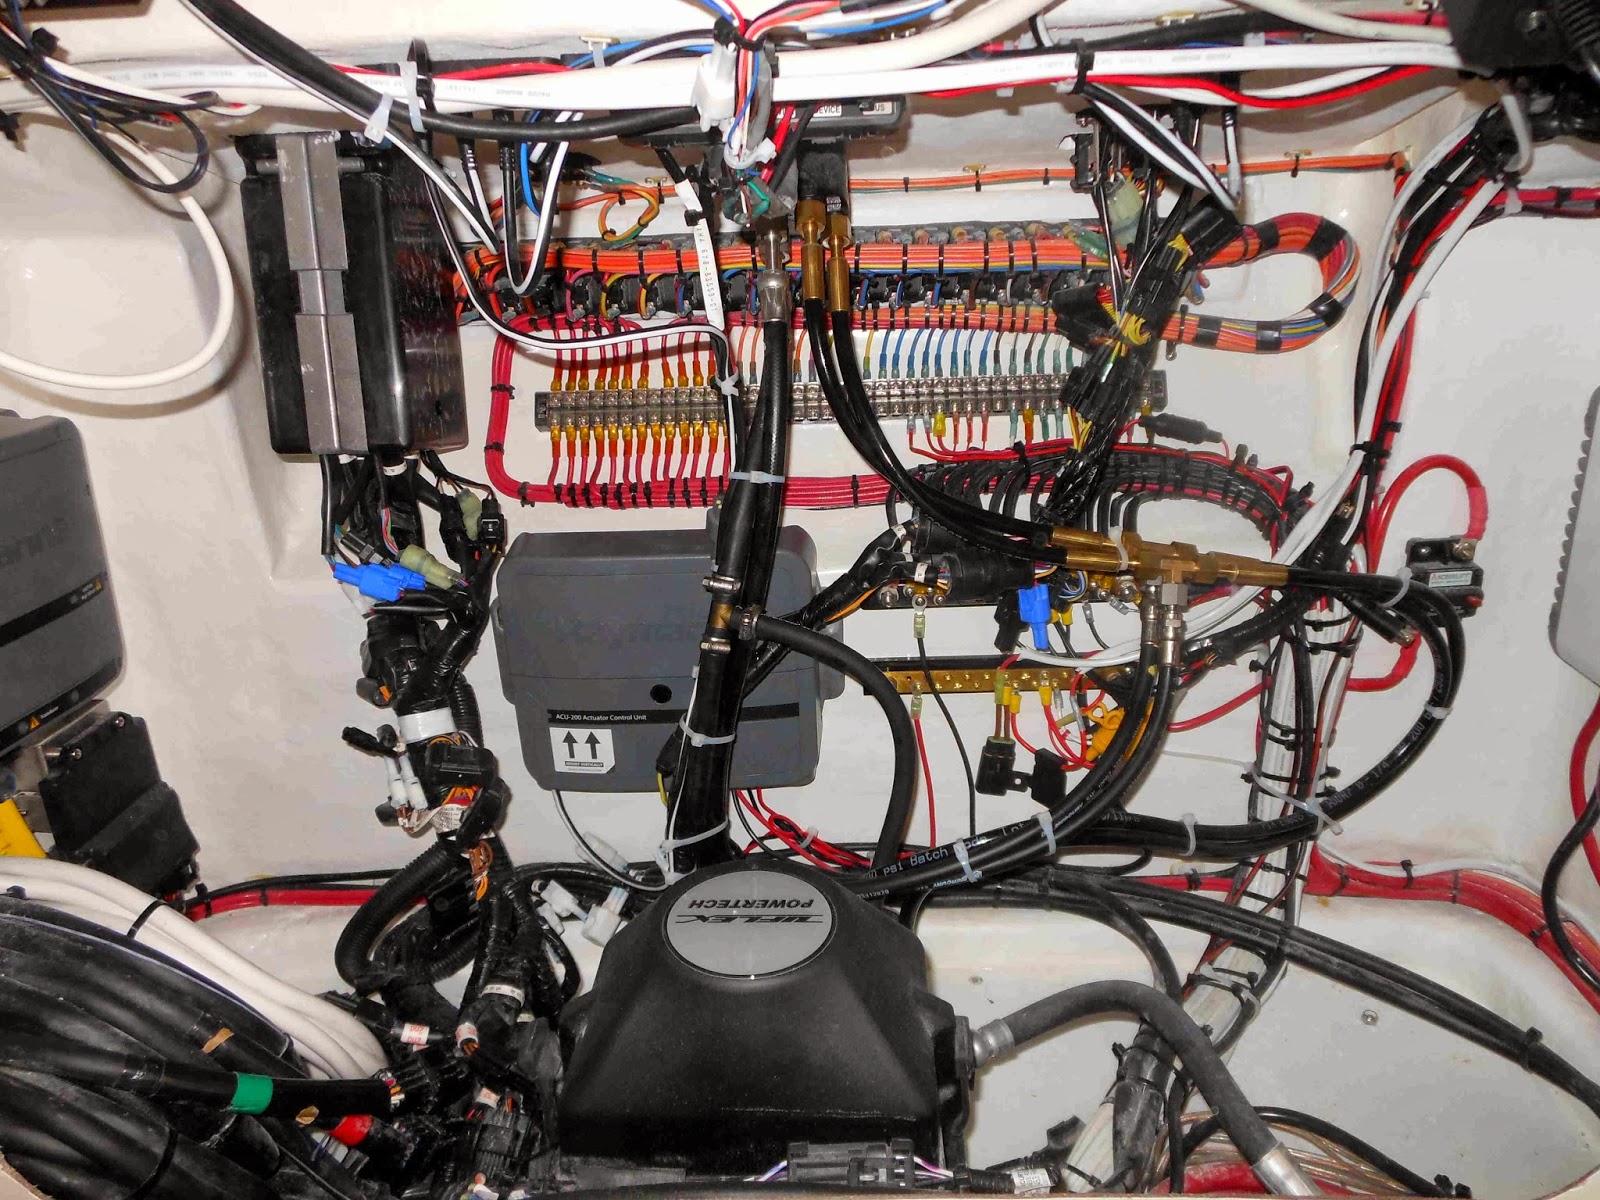 small resolution of boat wiring job suw ihero store u2022 rh suw ihero store boat wiring harness adapter boat wiring harness adapter